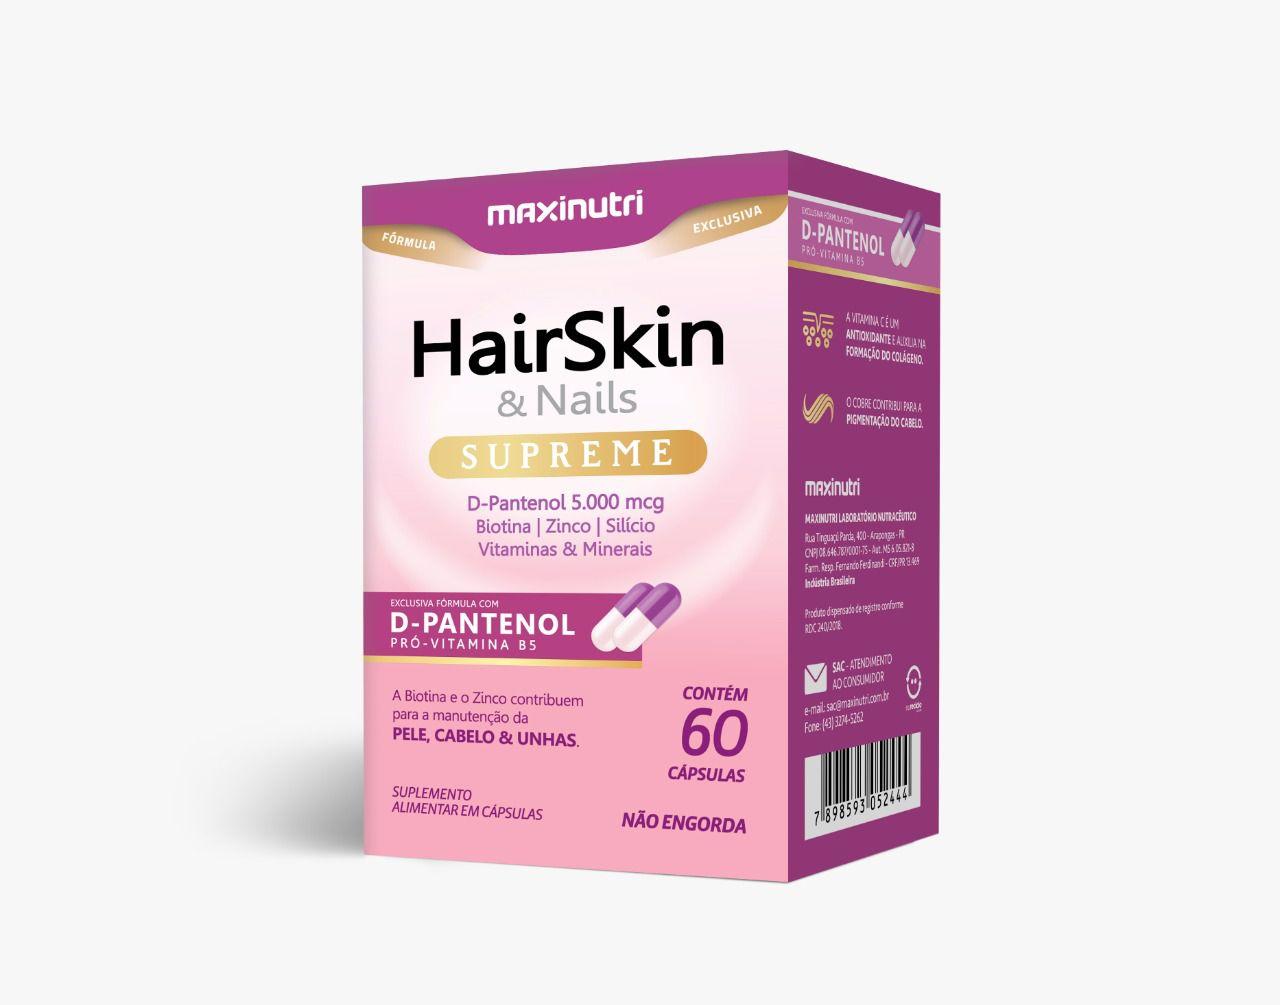 HairSkin & Nails Supreme 60 Cápsulas Maxinutri